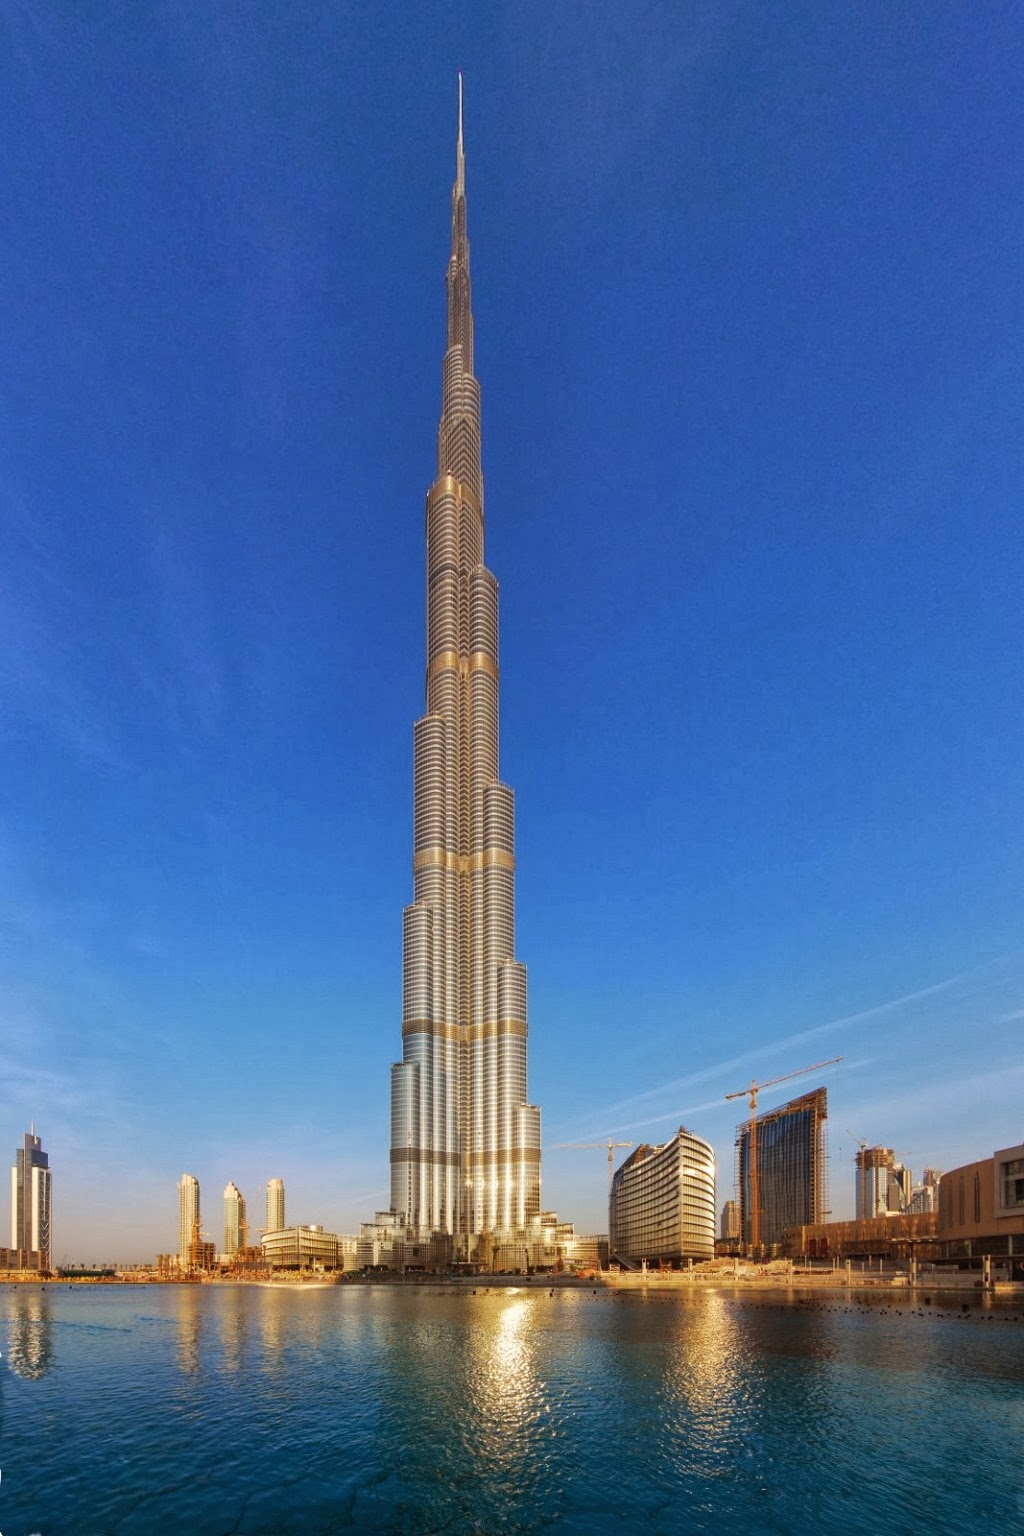 Travel Destinations Burj Khalifa The Height Of Architectural Marvel